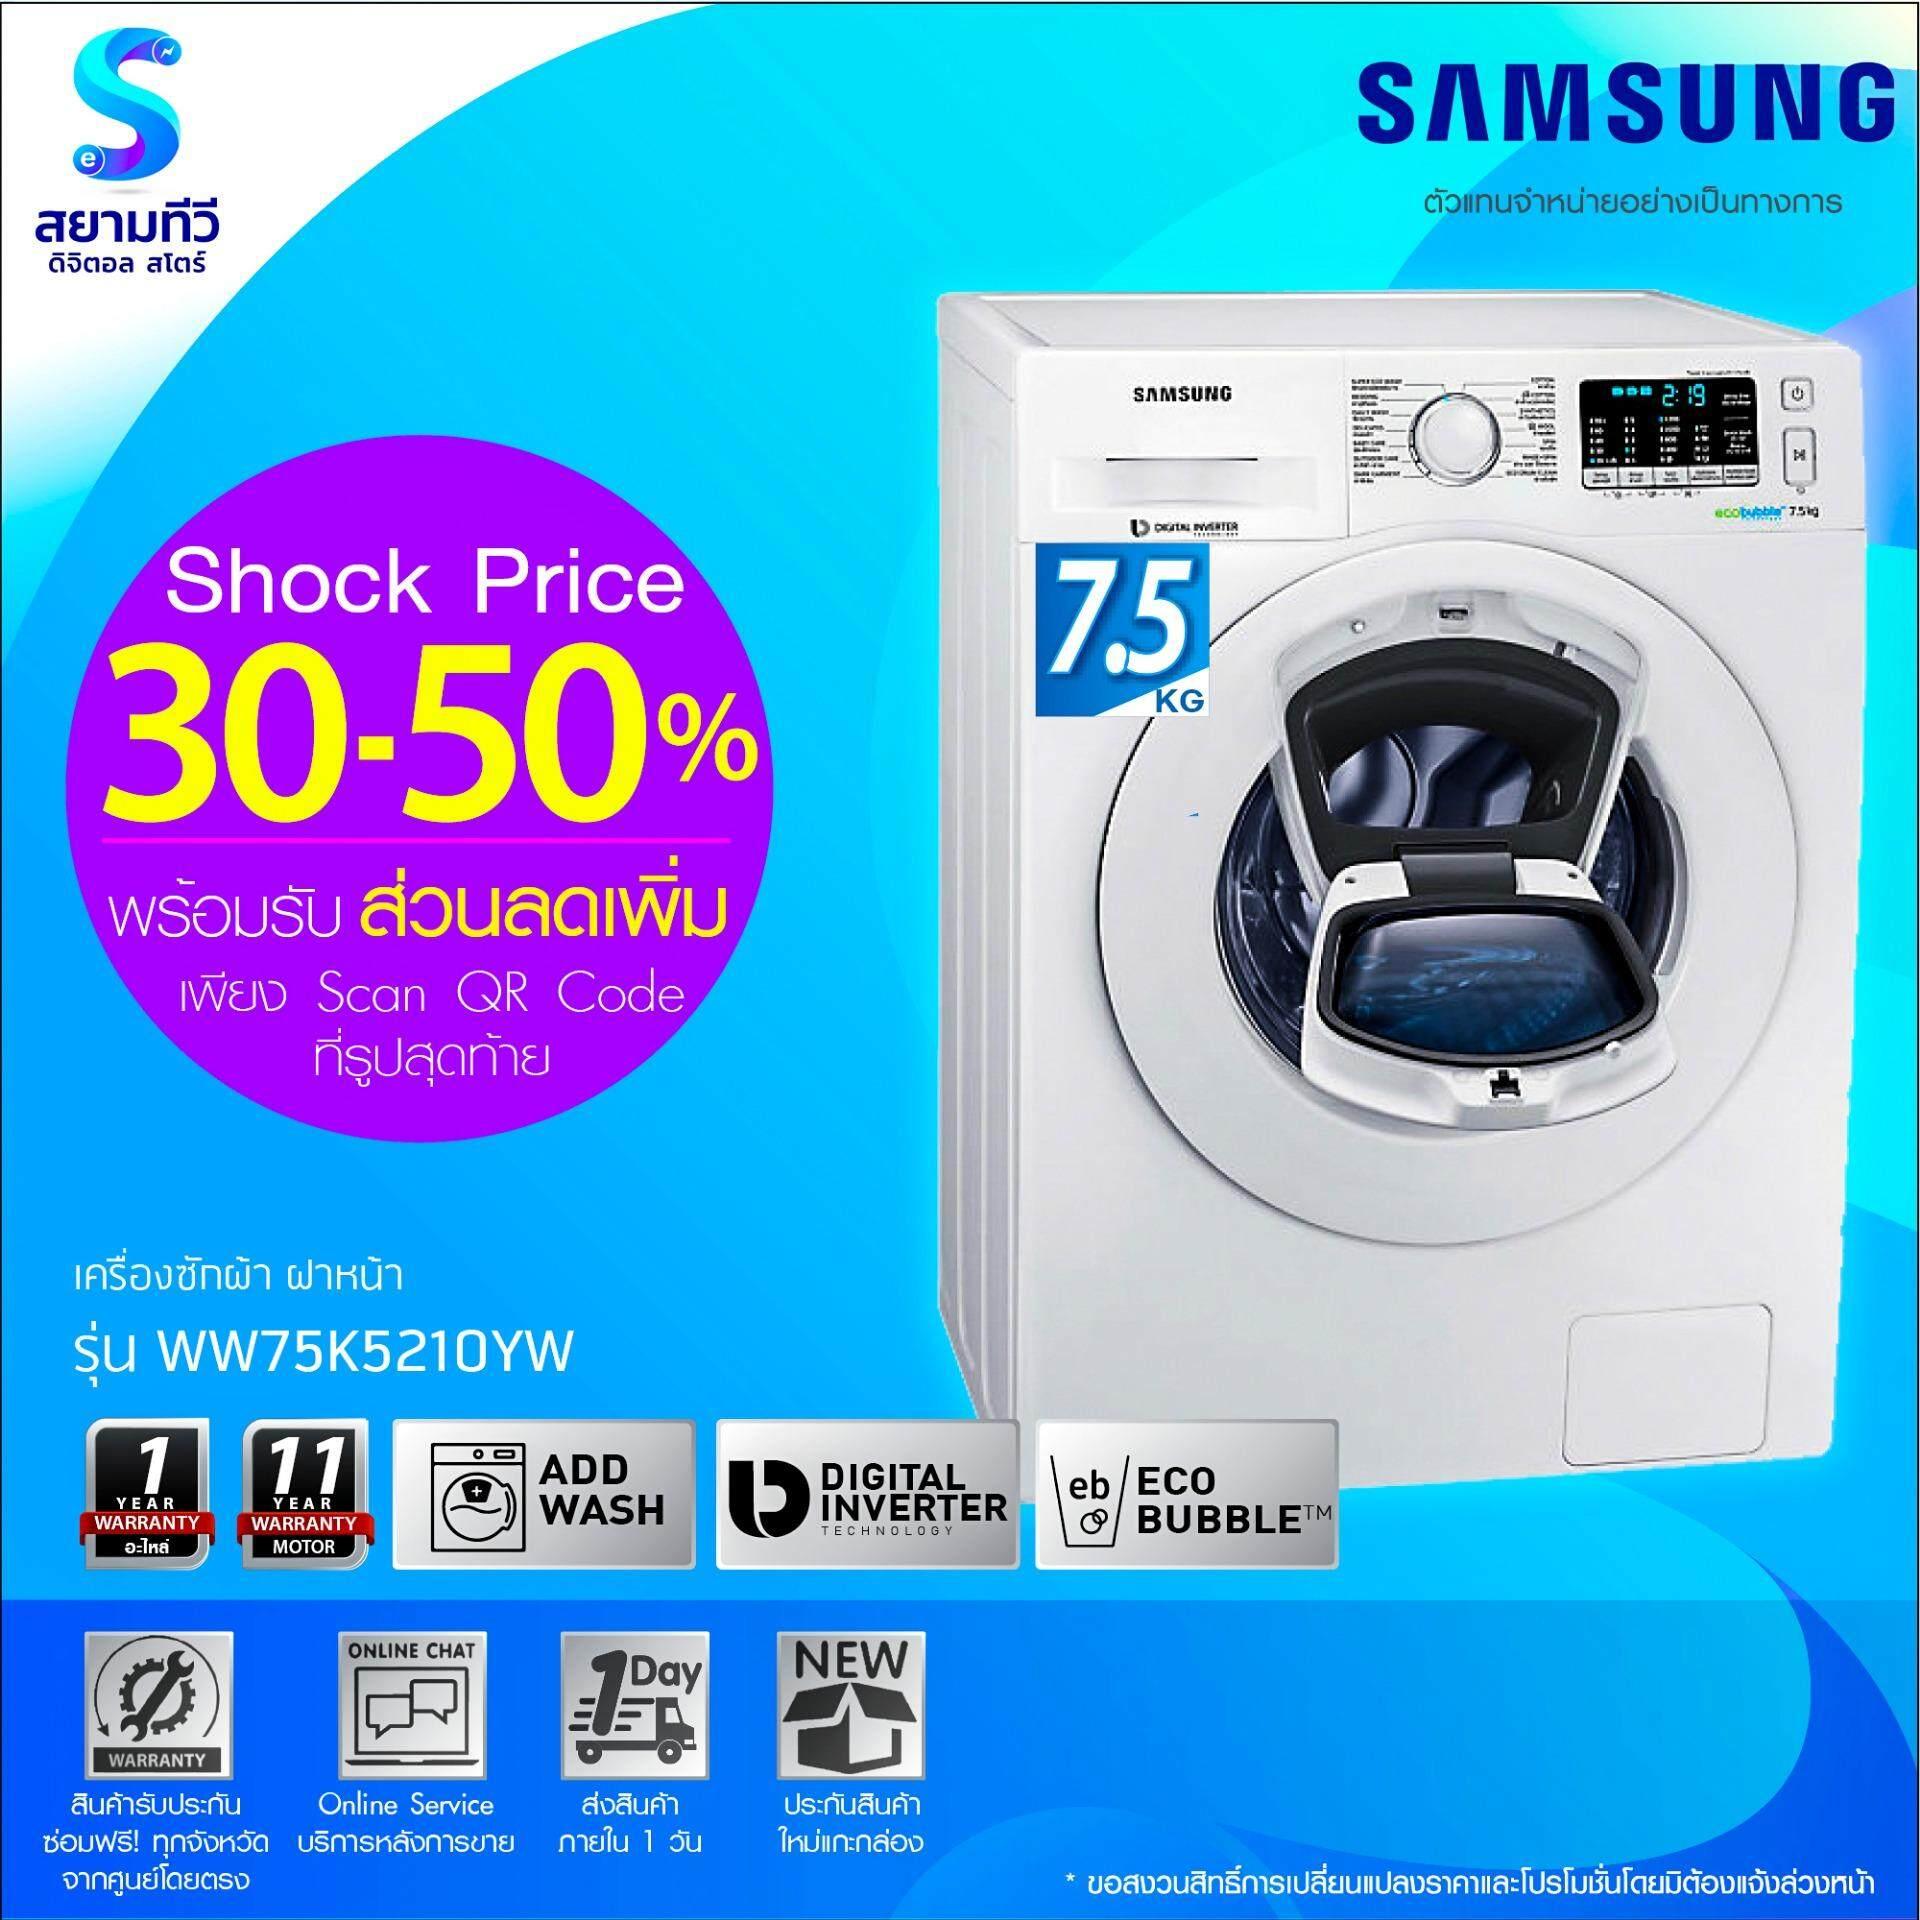 Samsung Front Loading Washer Ww75k5210yw Addwash 75kg White